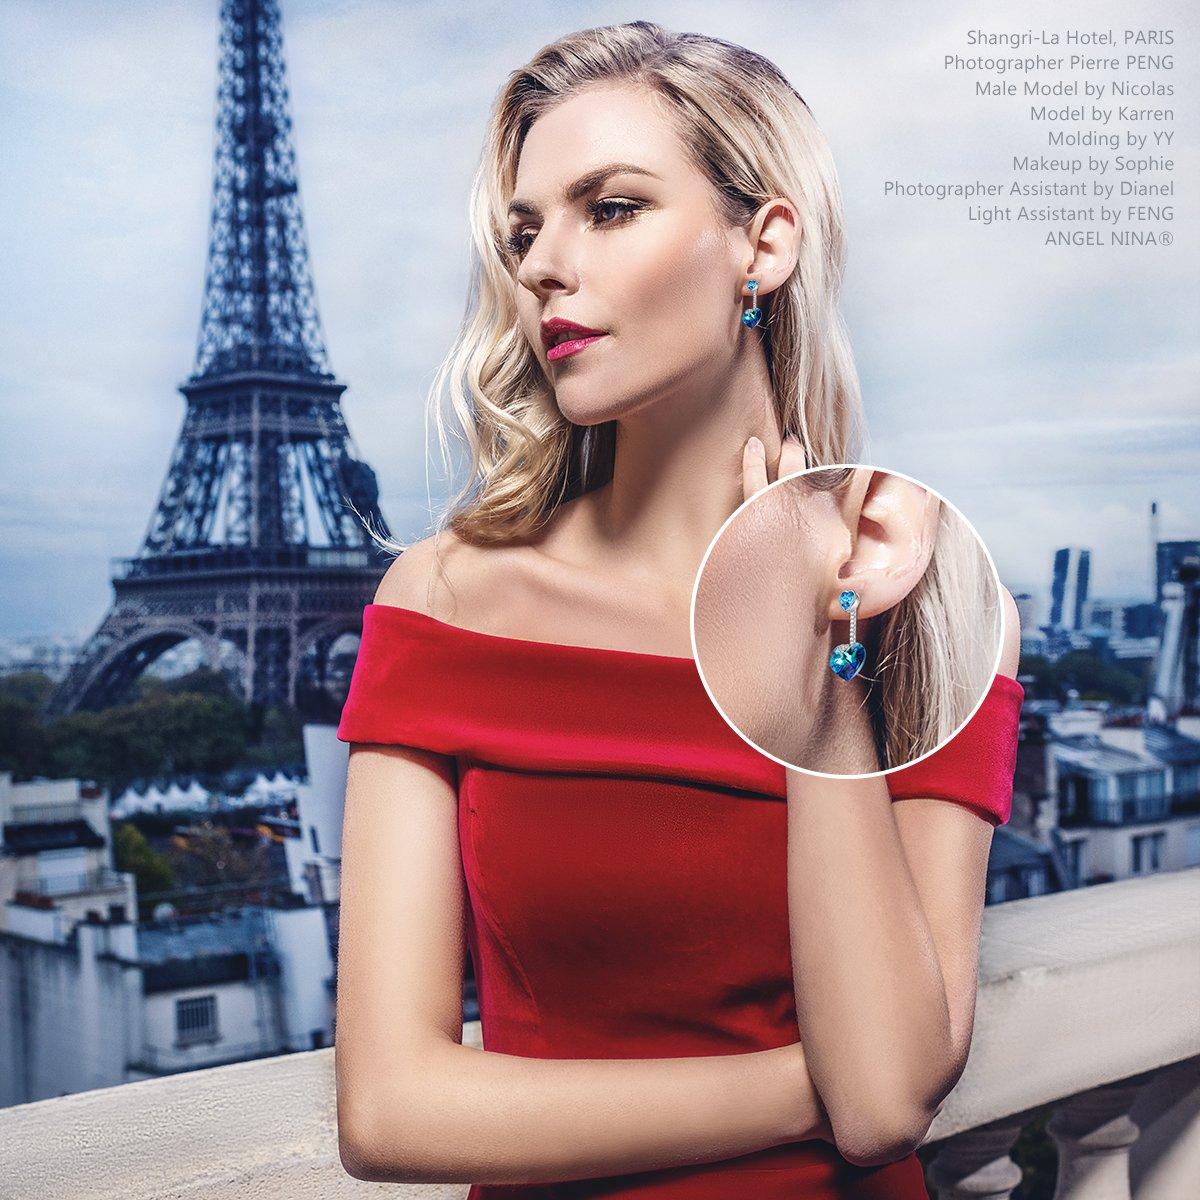 model angel Nina